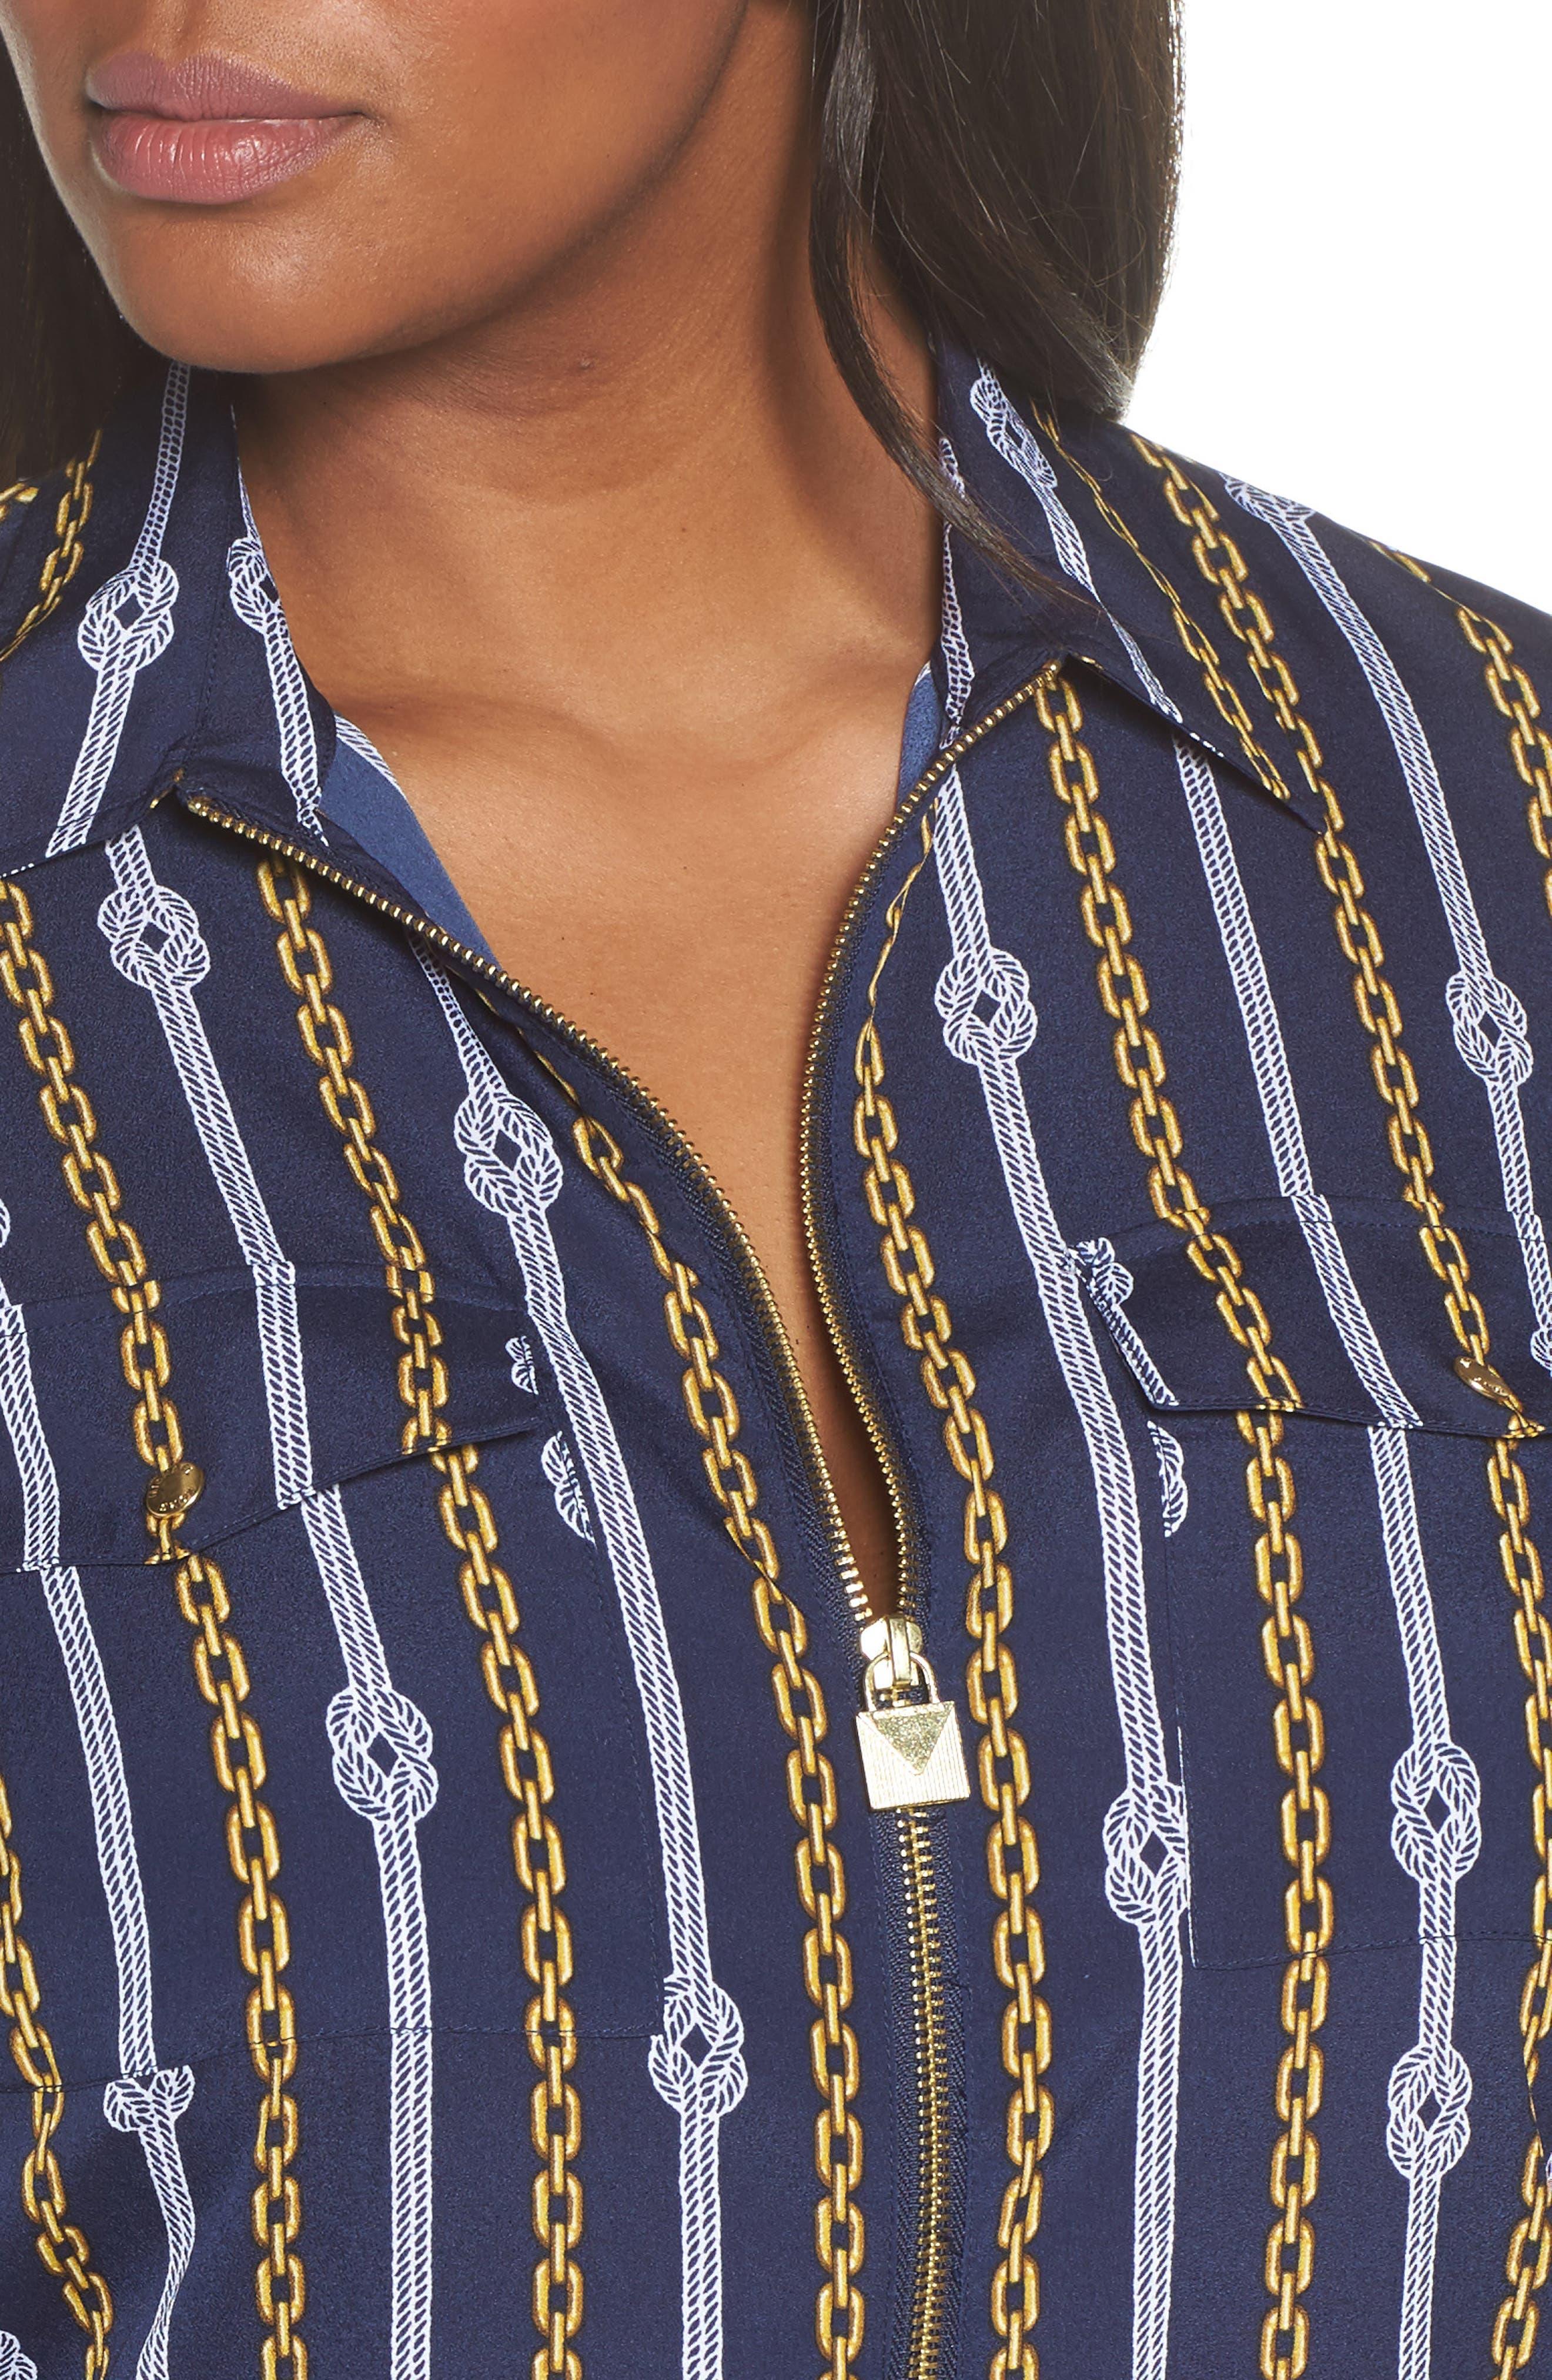 Print Zip Front Top,                             Alternate thumbnail 4, color,                             True Navy/ Gold